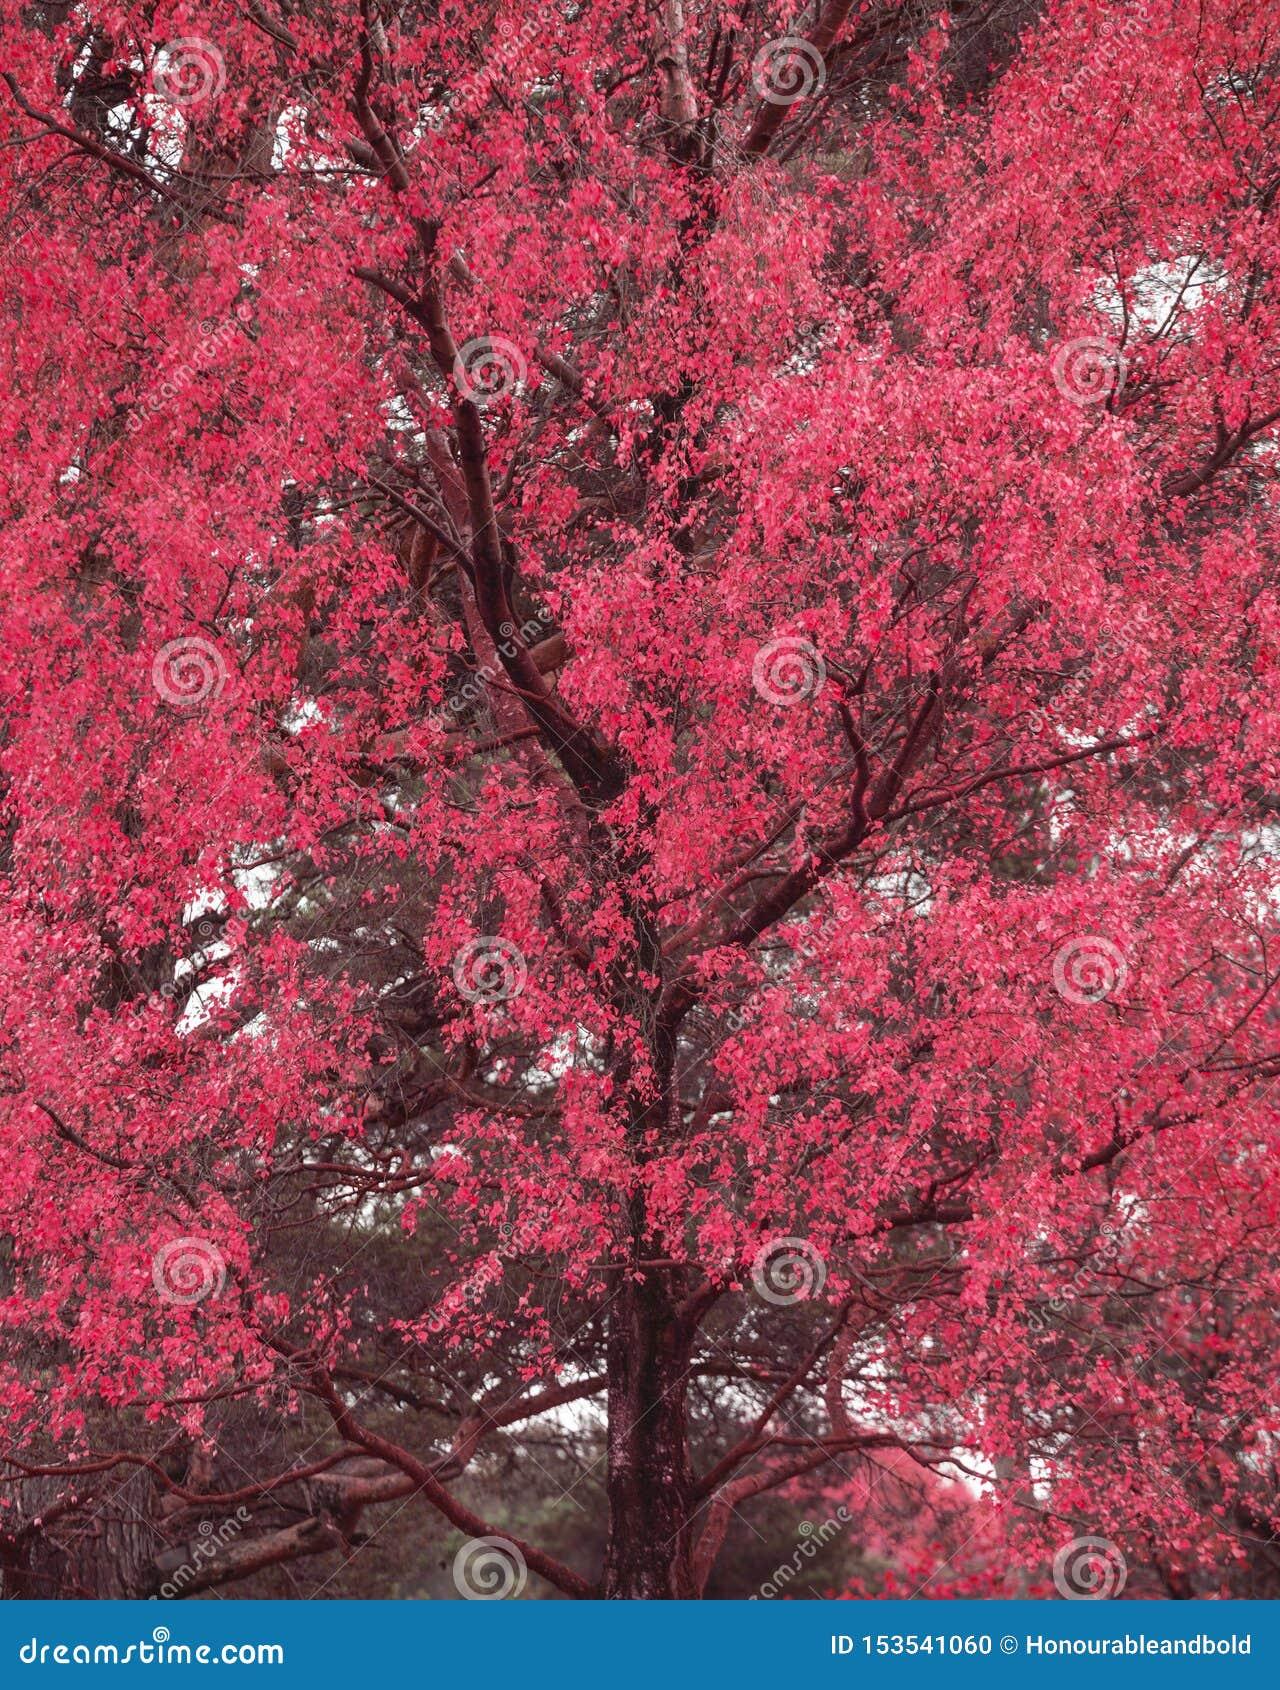 Surreal alternate red color vibrant forest woodland Autumn Fall landscape